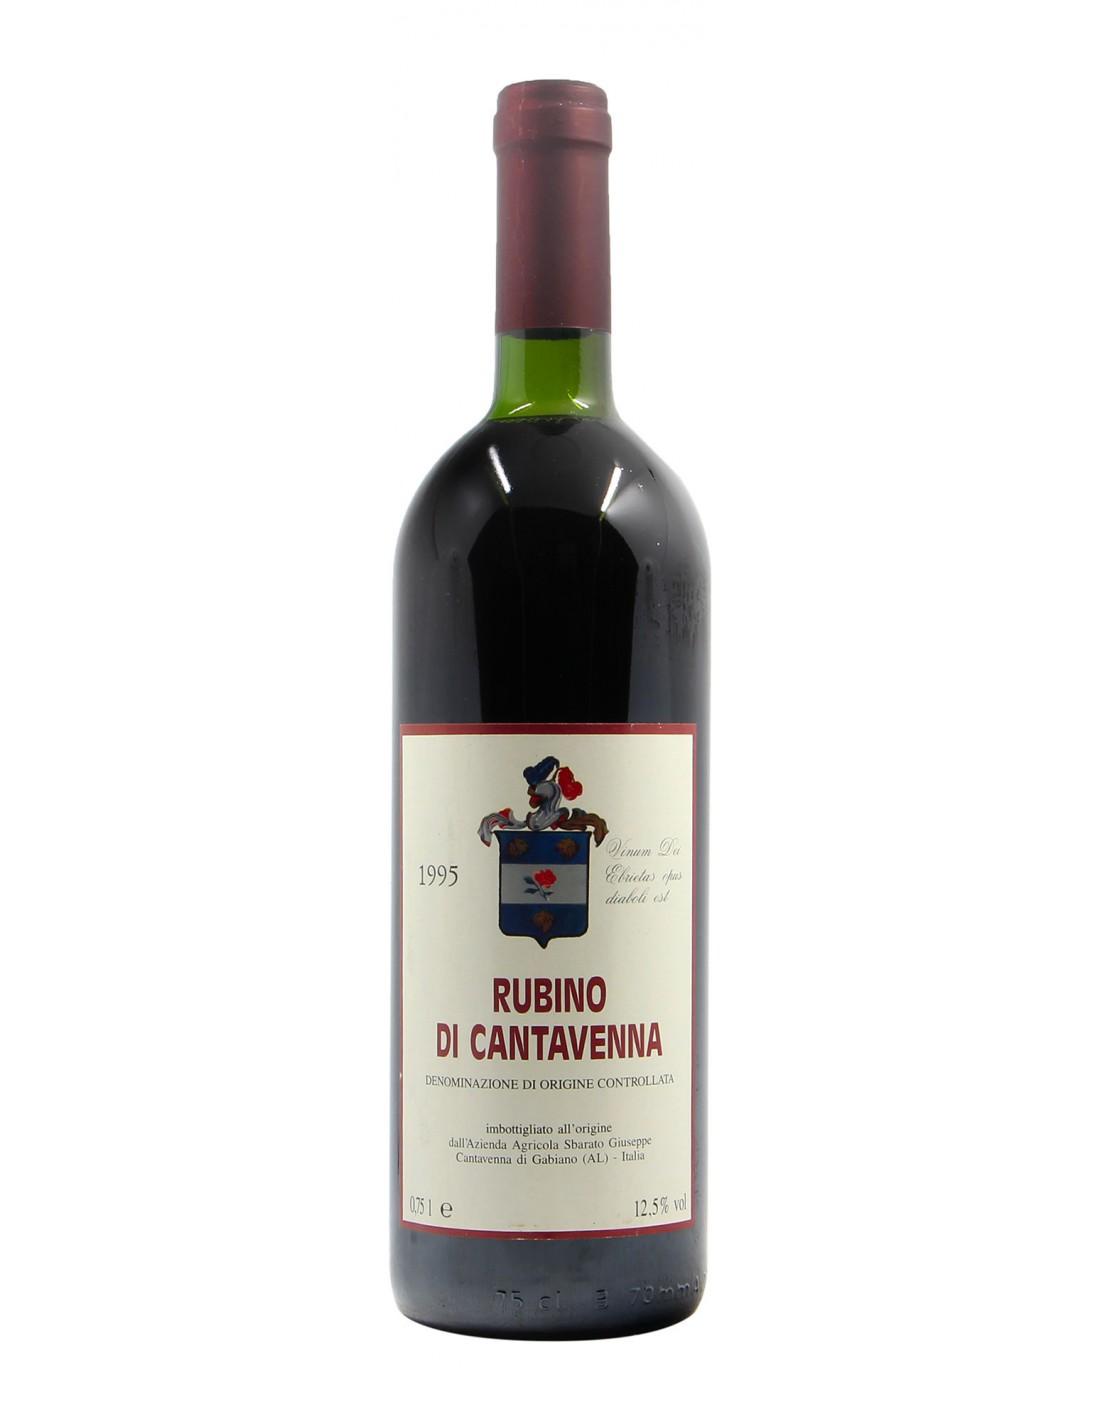 RUBINO DI CANTAVENNA 1995 SBARATO GIUSEPPE Grandi Bottiglie